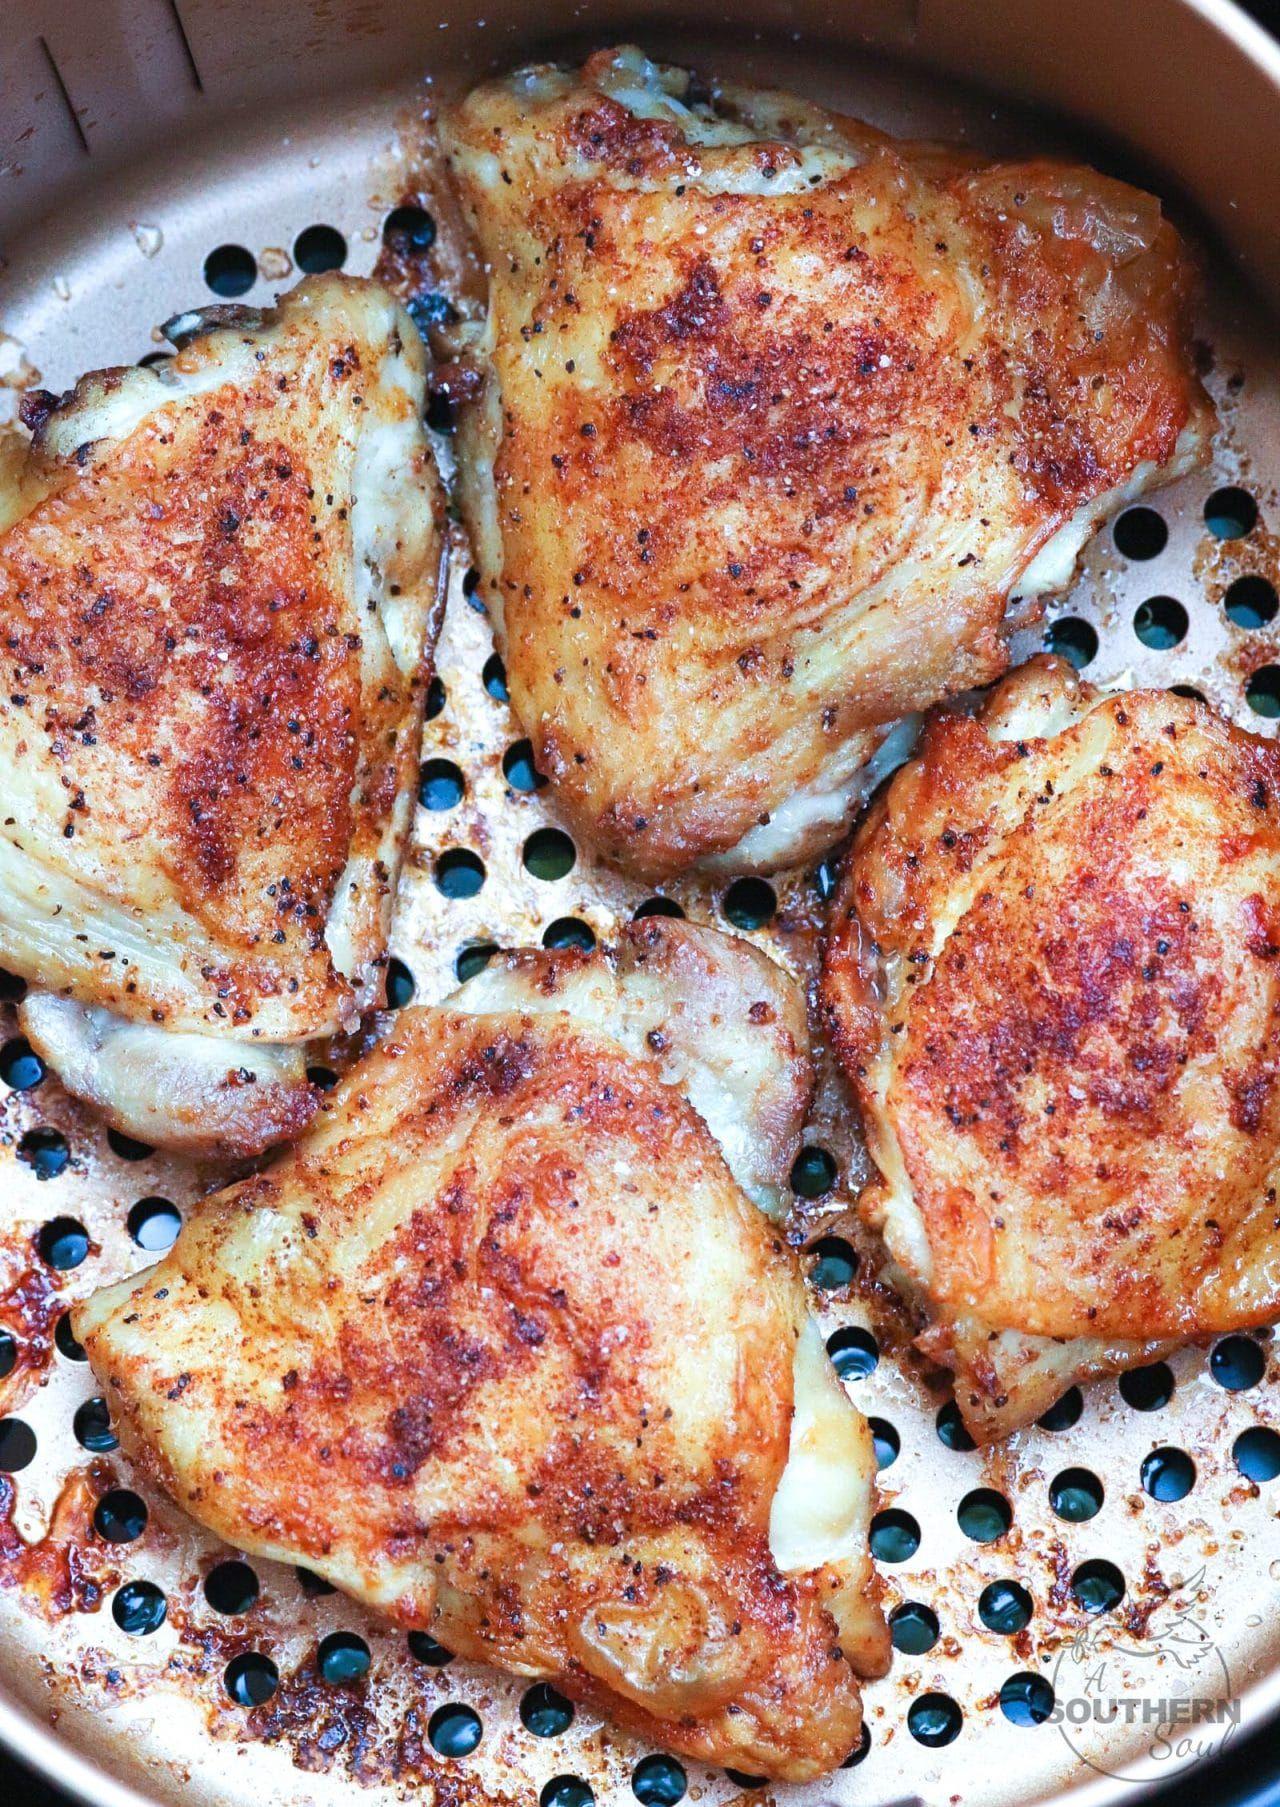 Air Fryer Chicken Thighs A Southern Soul Air fryer